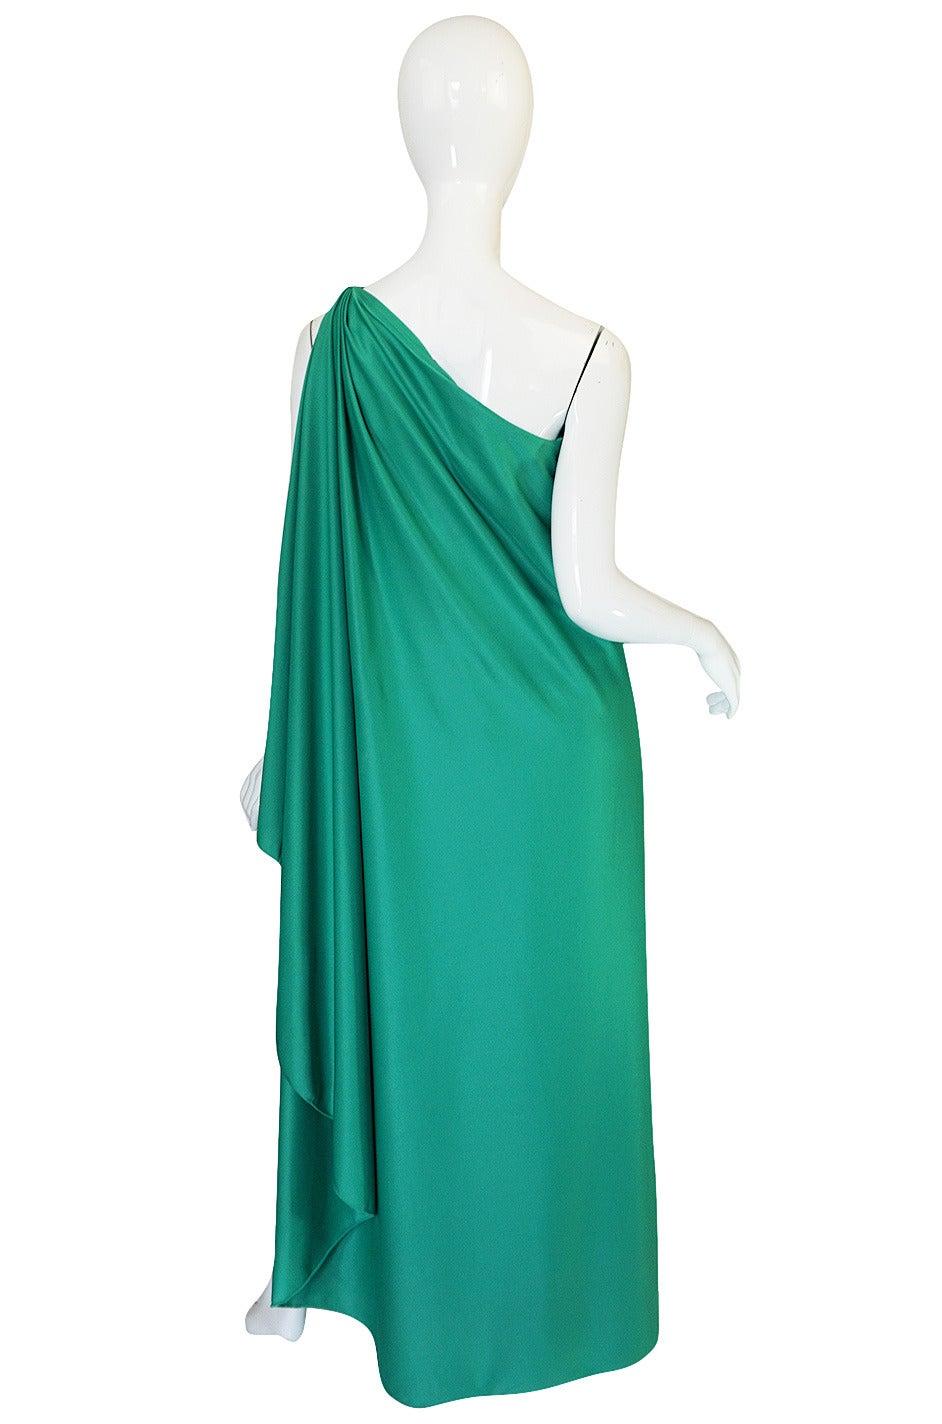 1970s Halston One Shoulder Jersey Green Dress At 1stdibs